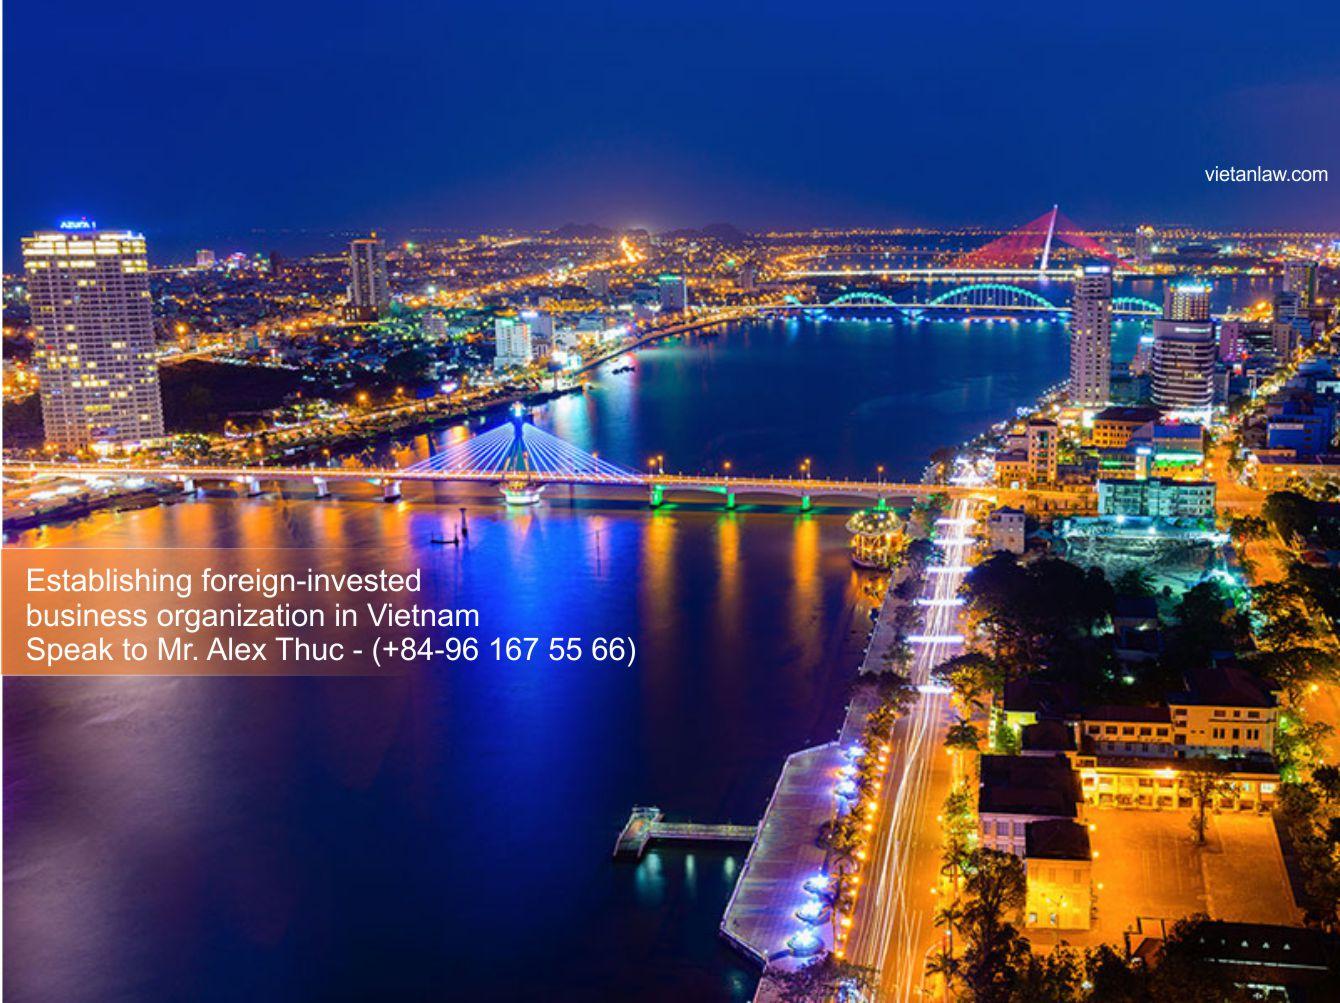 Establishing foreign-invested business organization in Vietnam-Alex